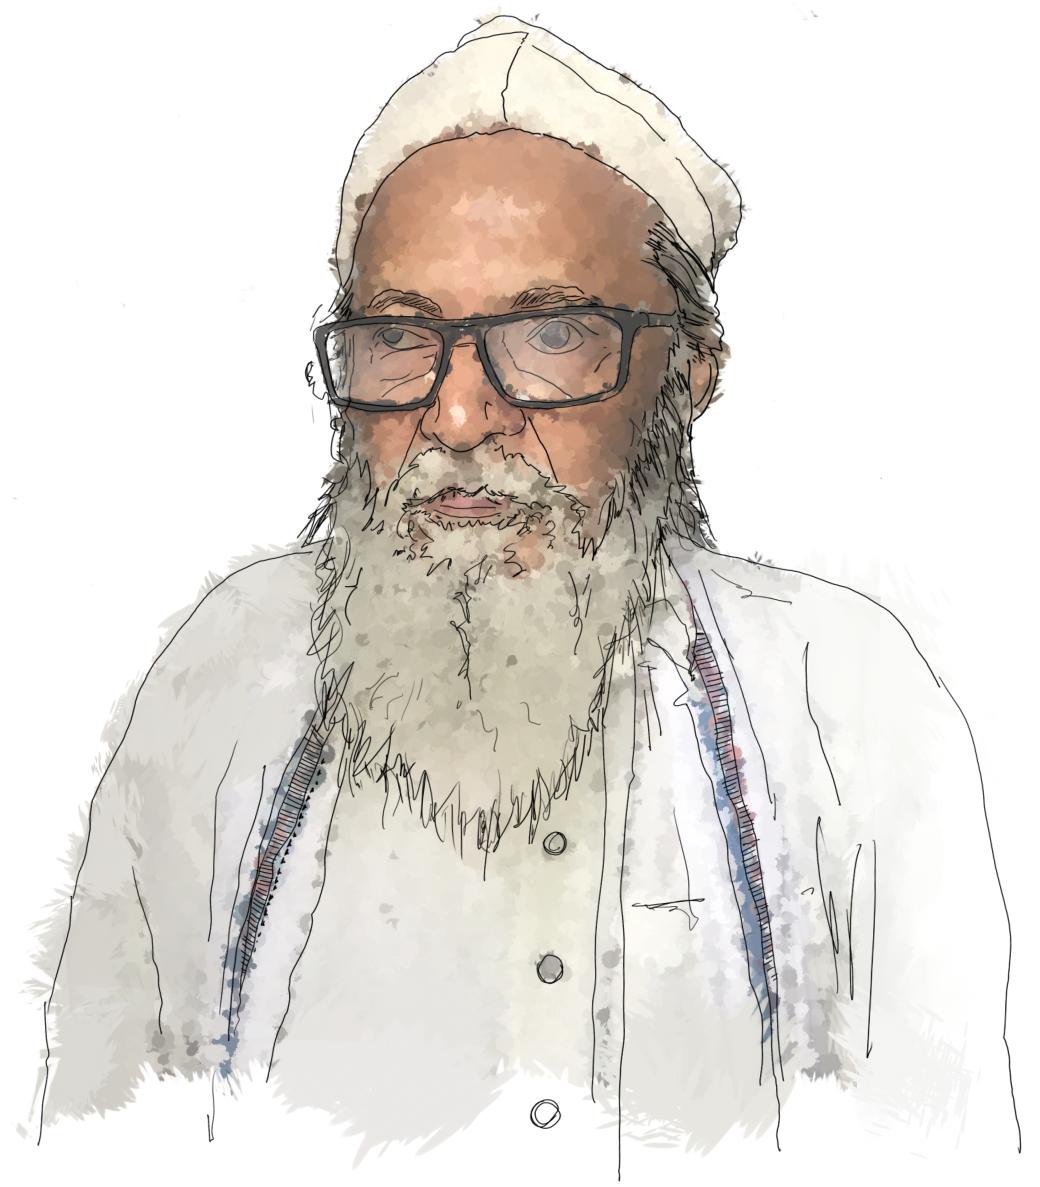 02/gta-webinar-farhad_mazhar.png